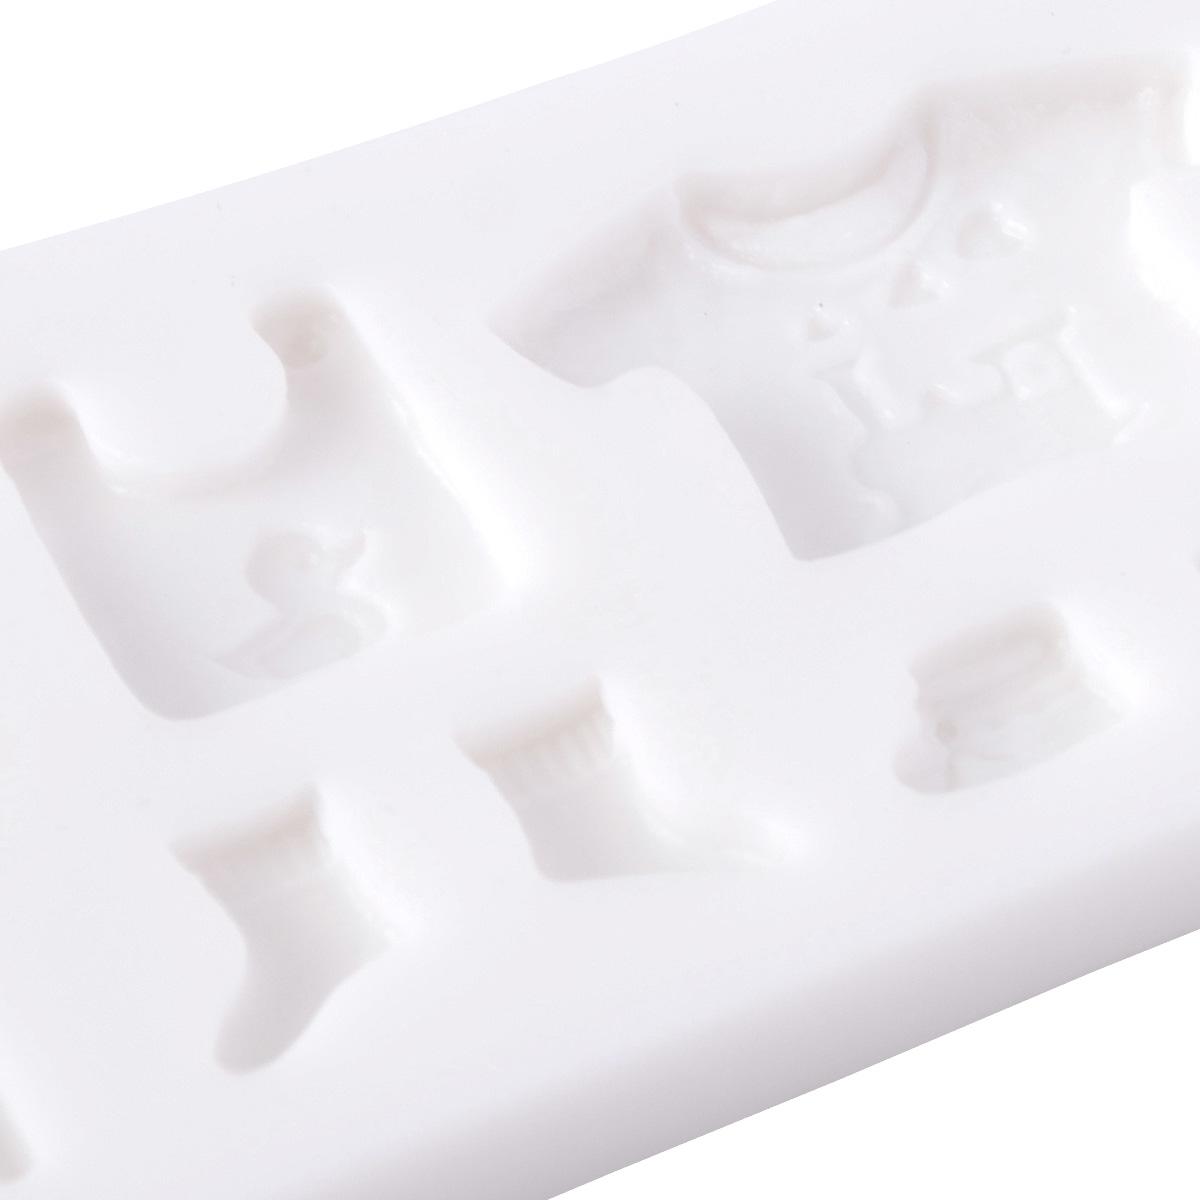 baby kleidung motive silikon ausstechform ausstecher. Black Bedroom Furniture Sets. Home Design Ideas